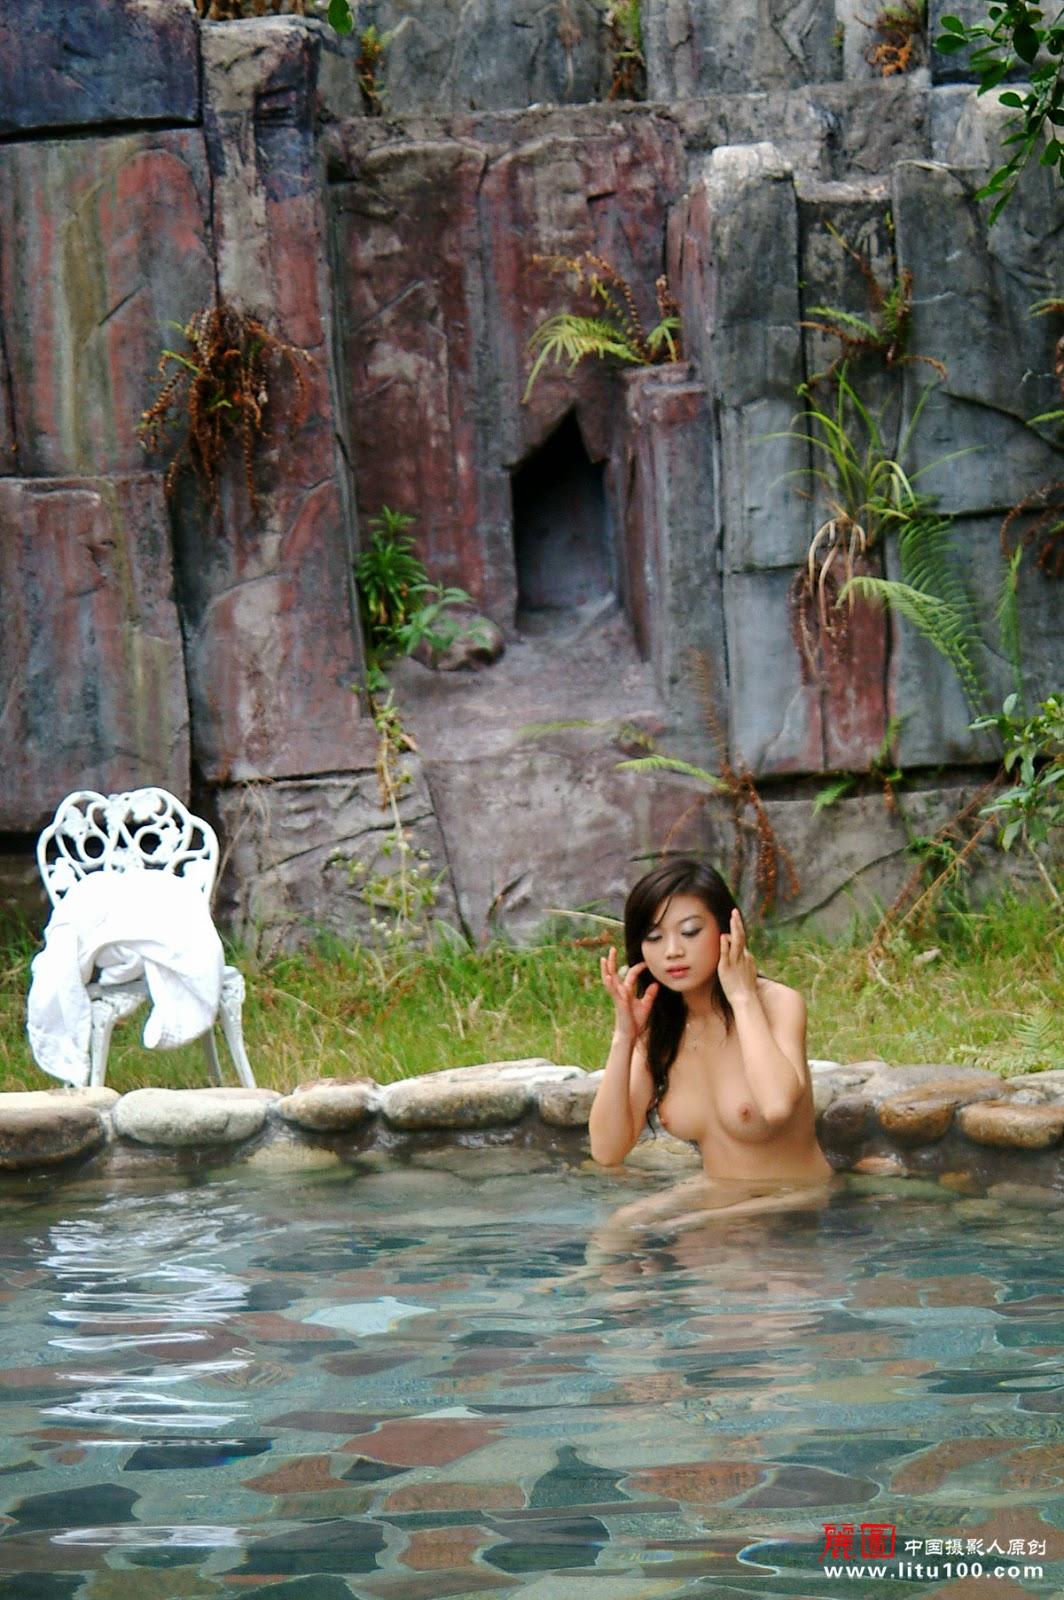 Chinese Nude Model Yu Hui [Litu100] | 18+ gallery photos